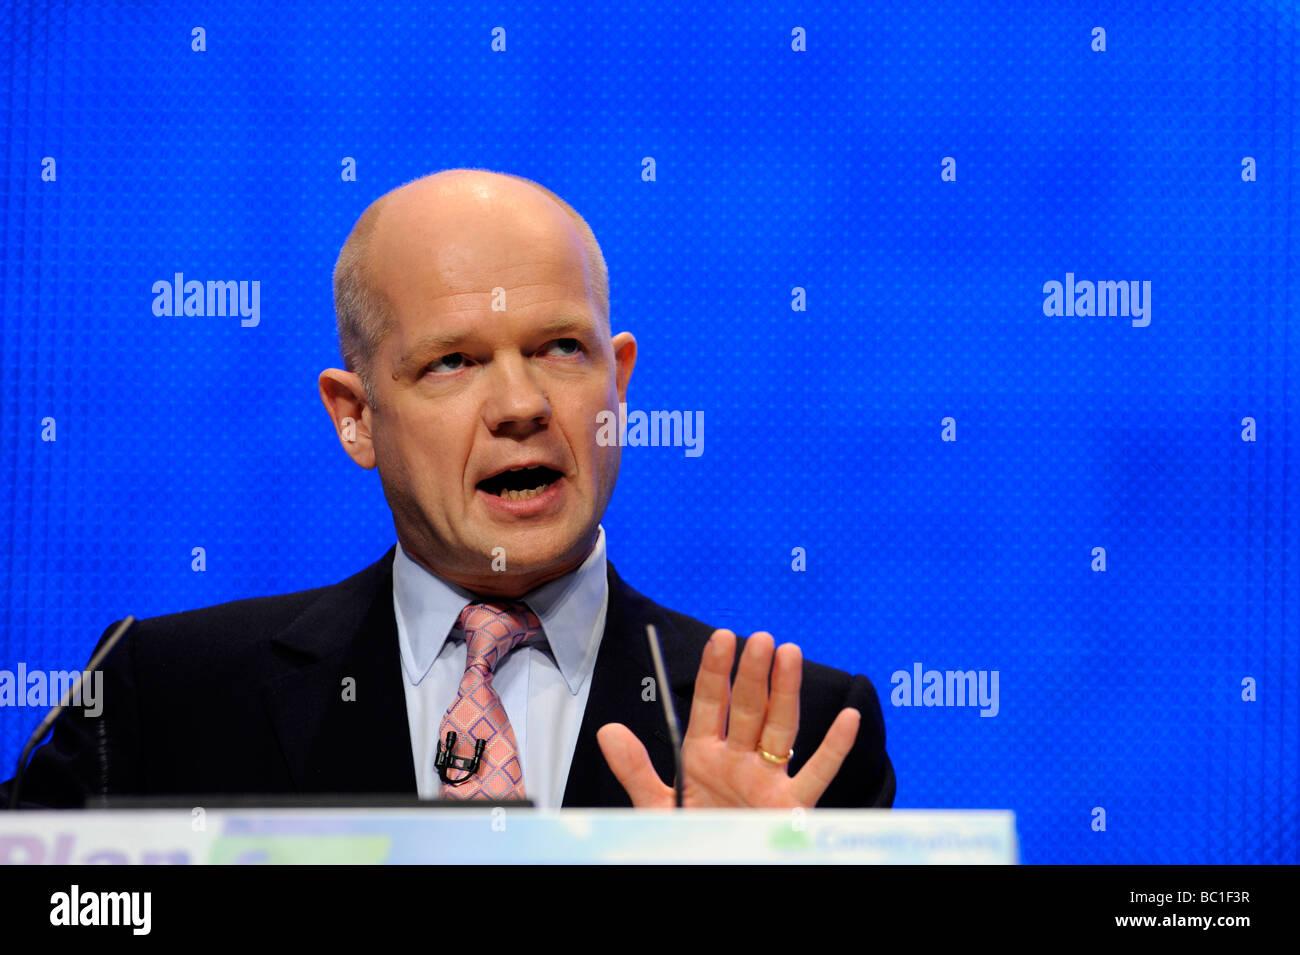 William Hague MP, Foreign Secretary - Stock Image